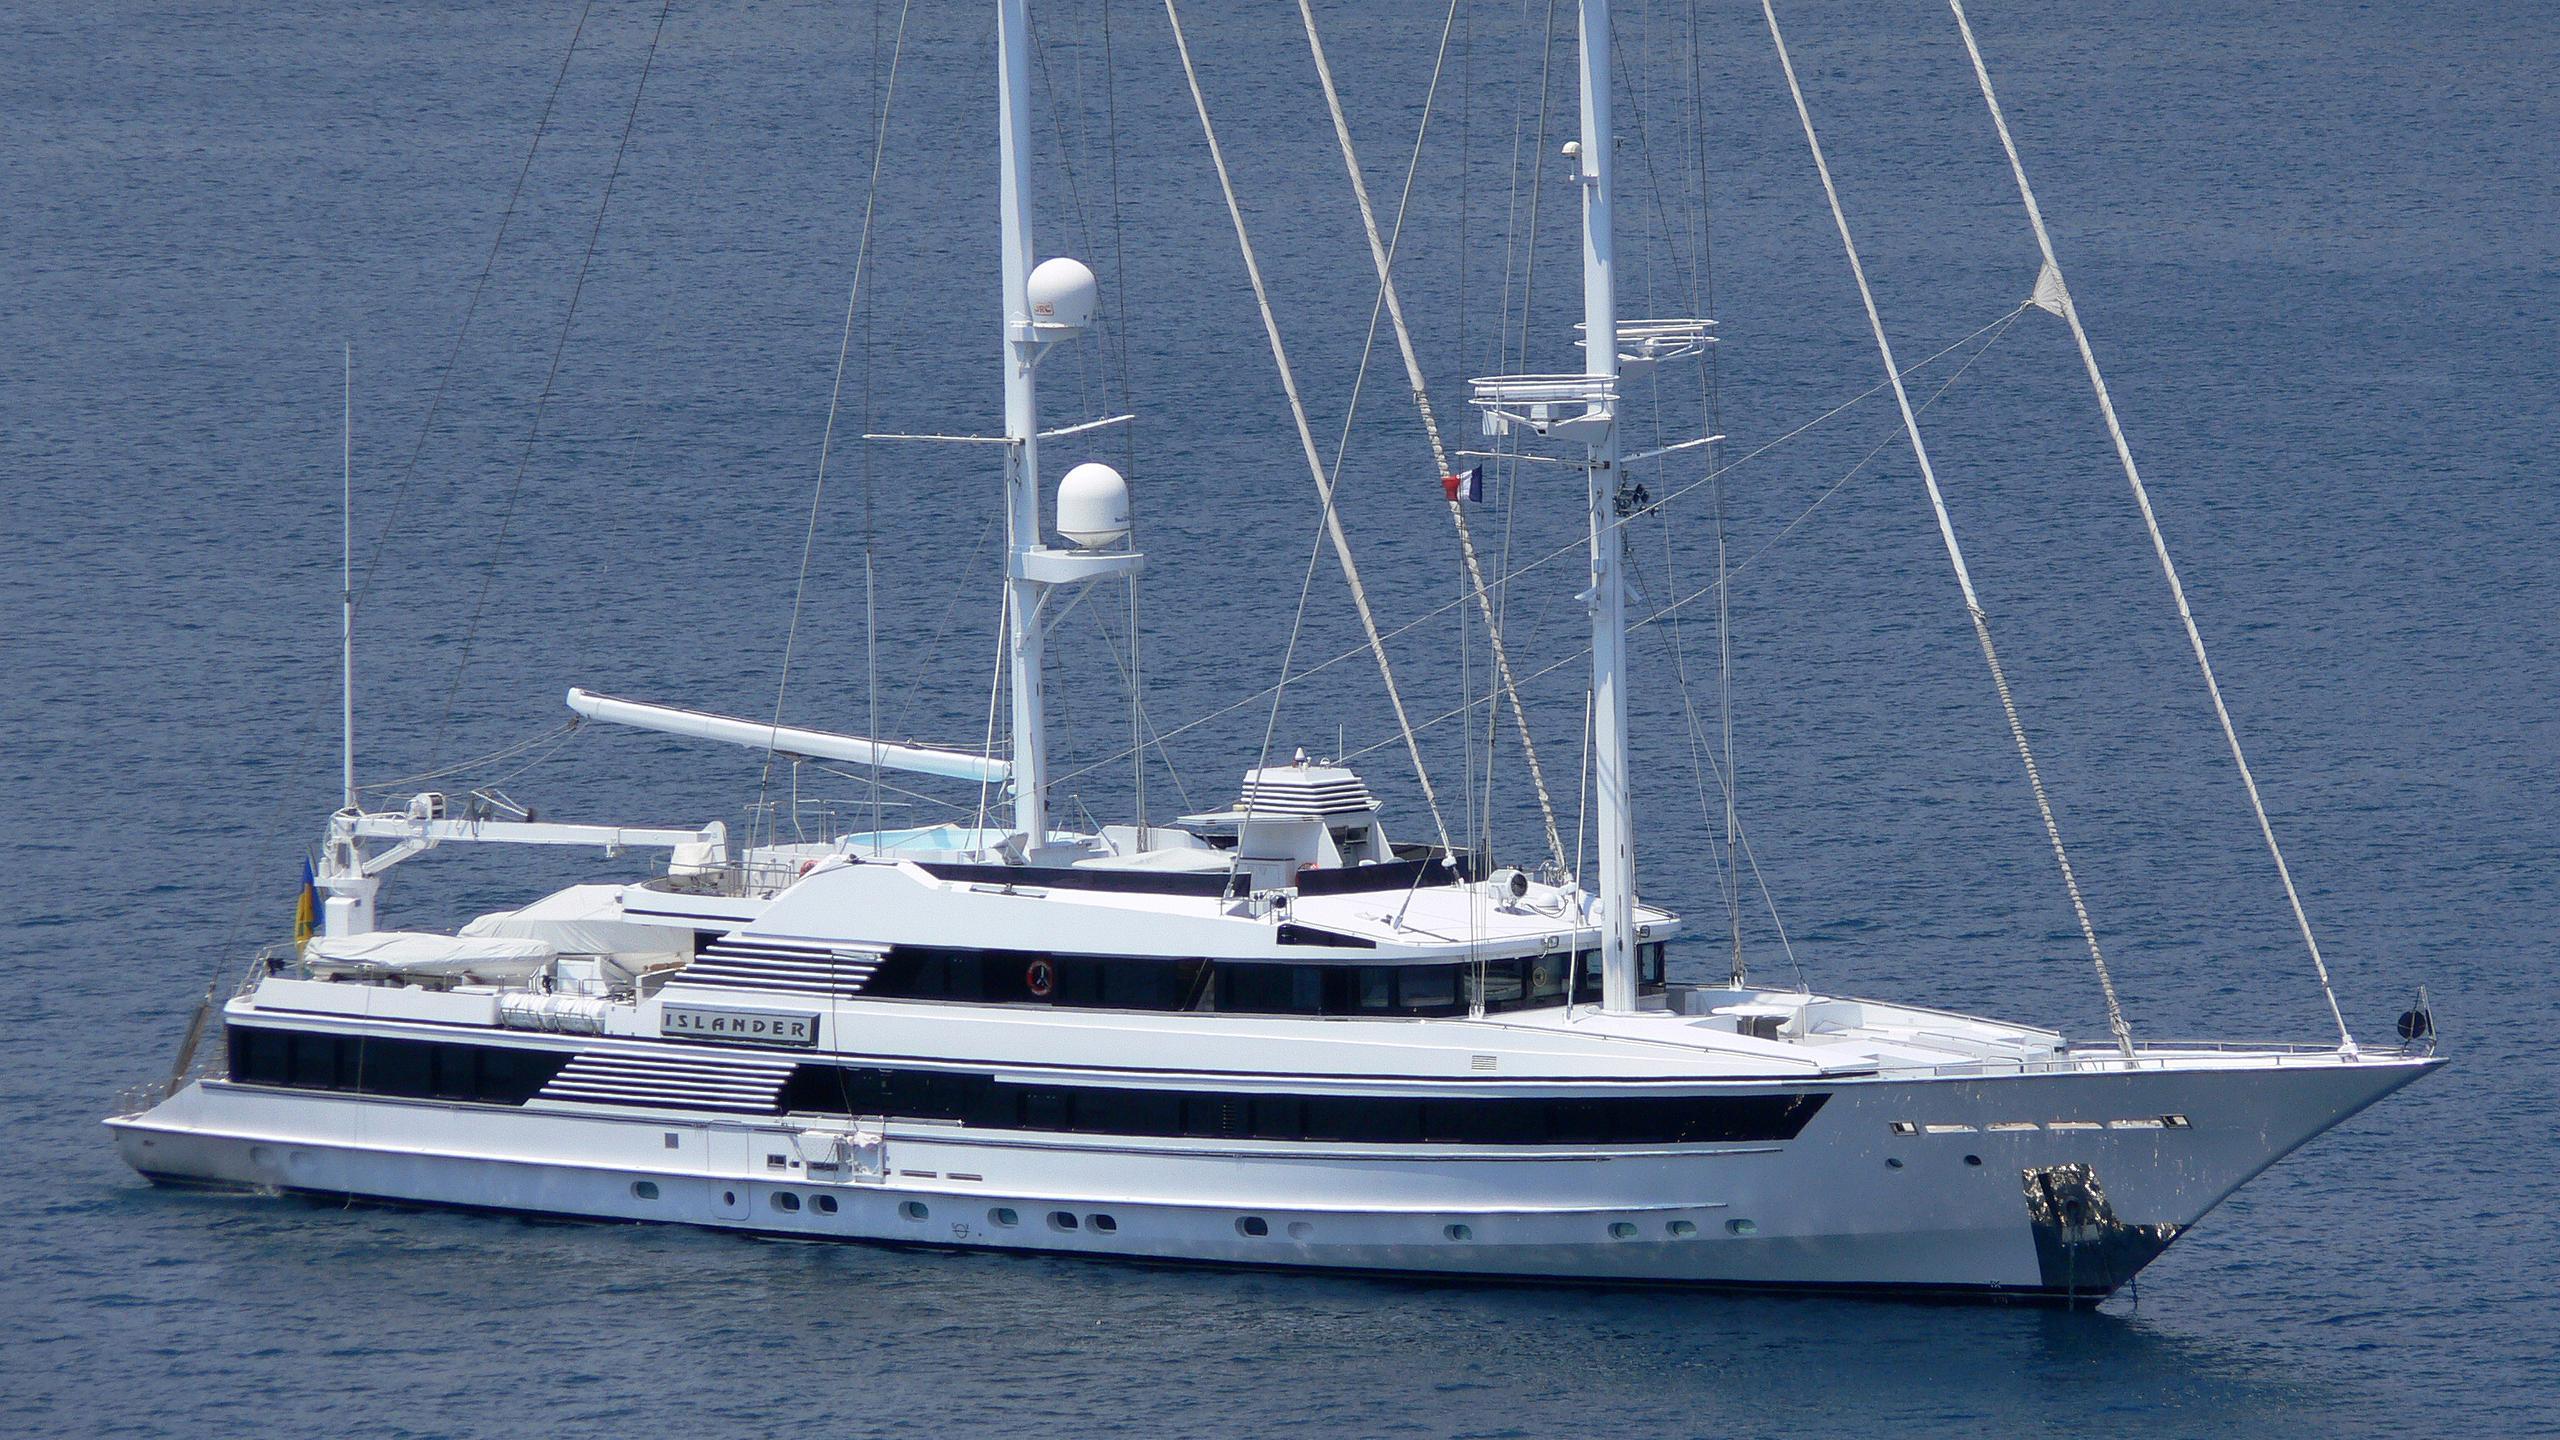 fam-islander-yacht-exterior